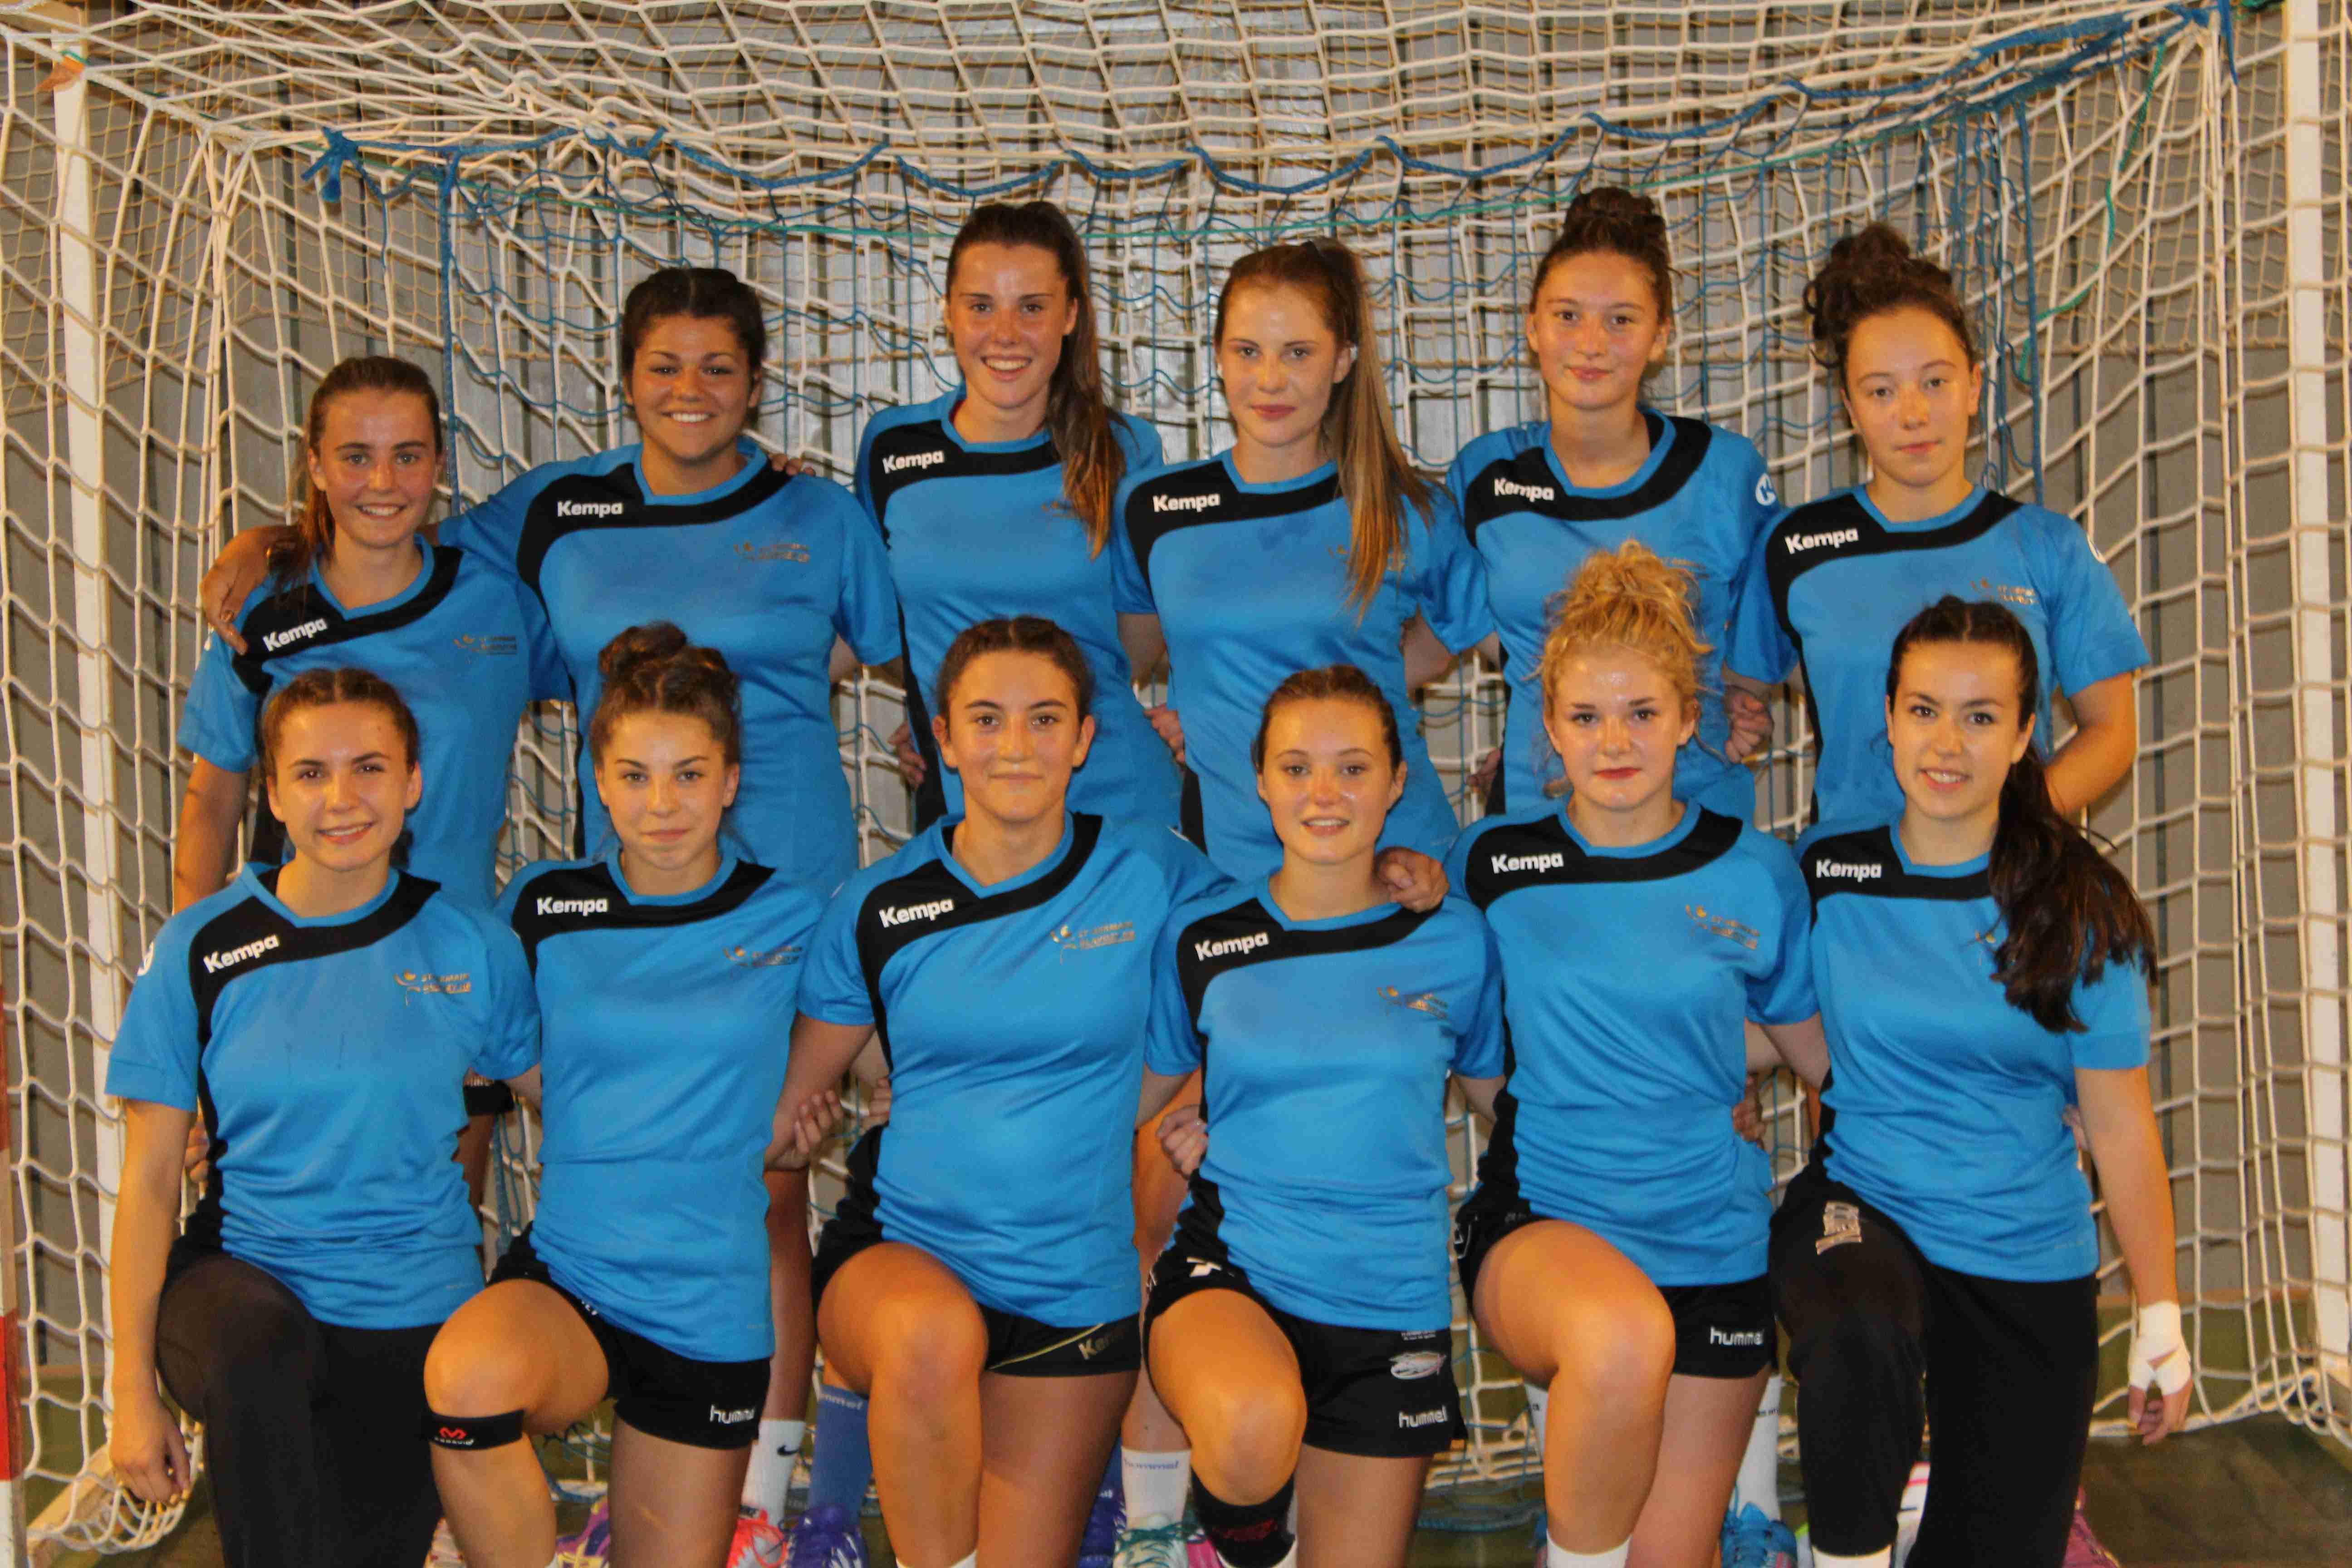 handball u18f nationale st germain blavozy27-37 bouillargues